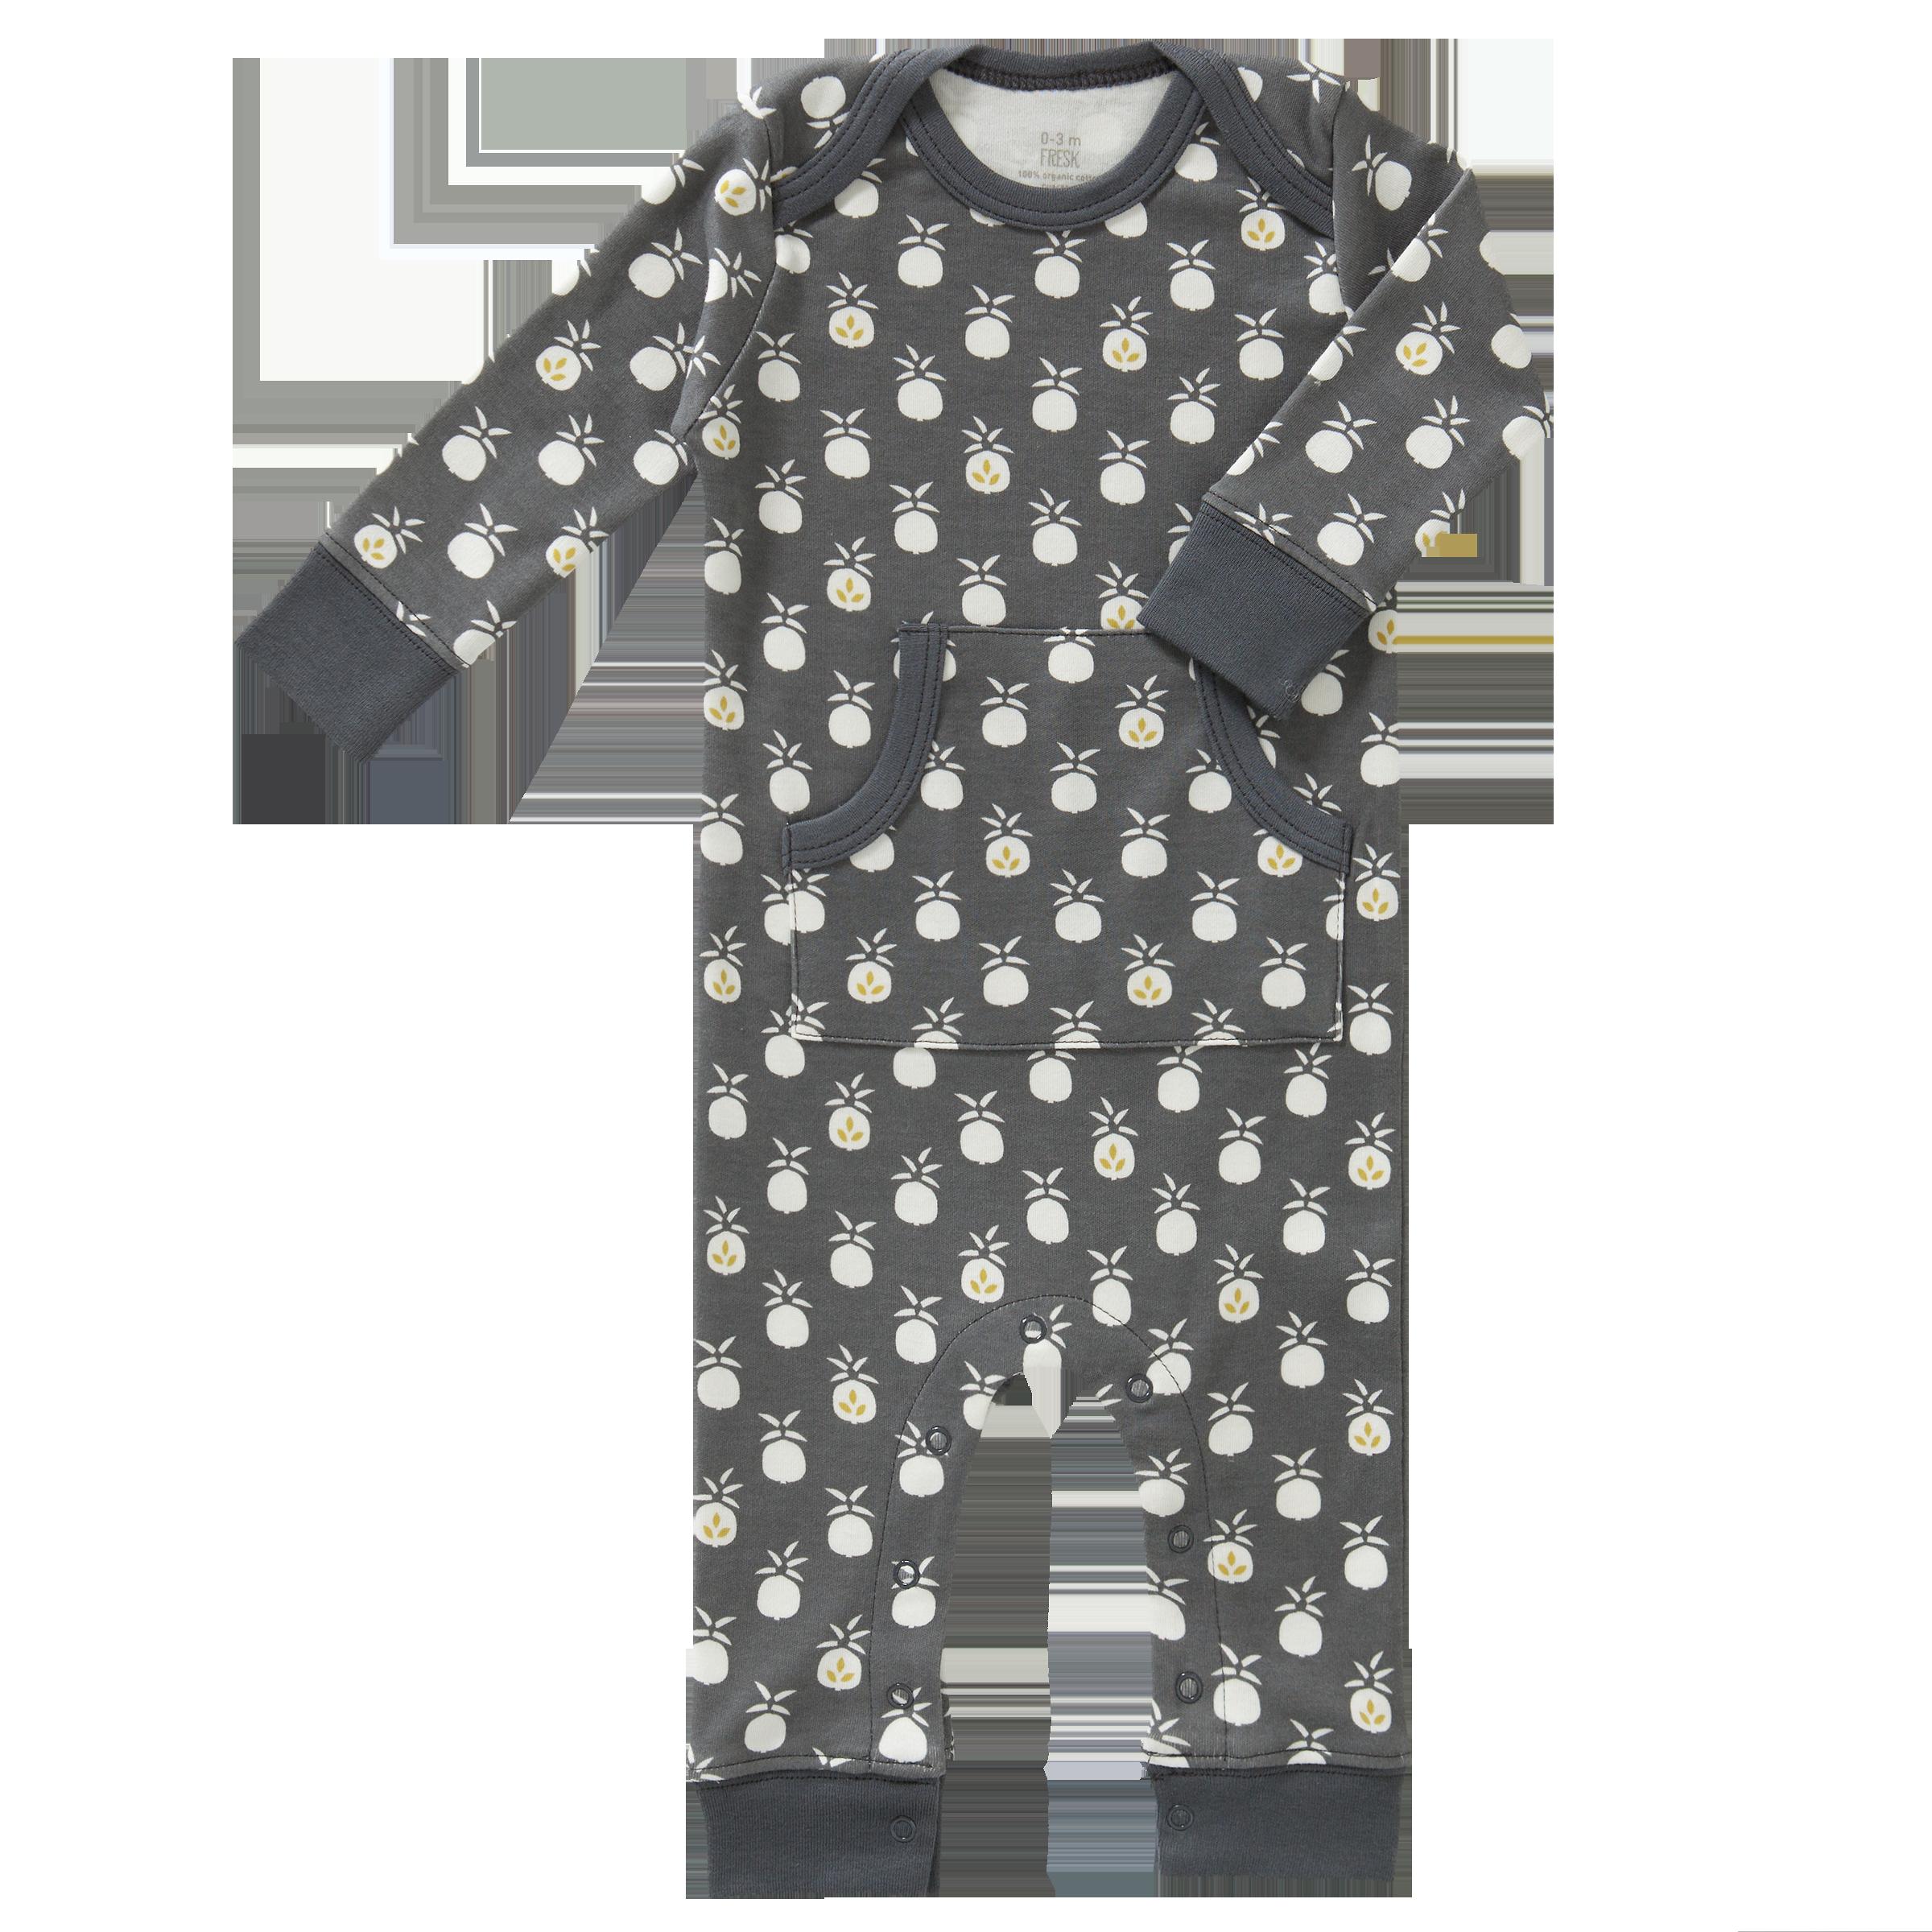 Pyjama - Strampler | Schlafanzug - Pineapple anthrazit - Fresk